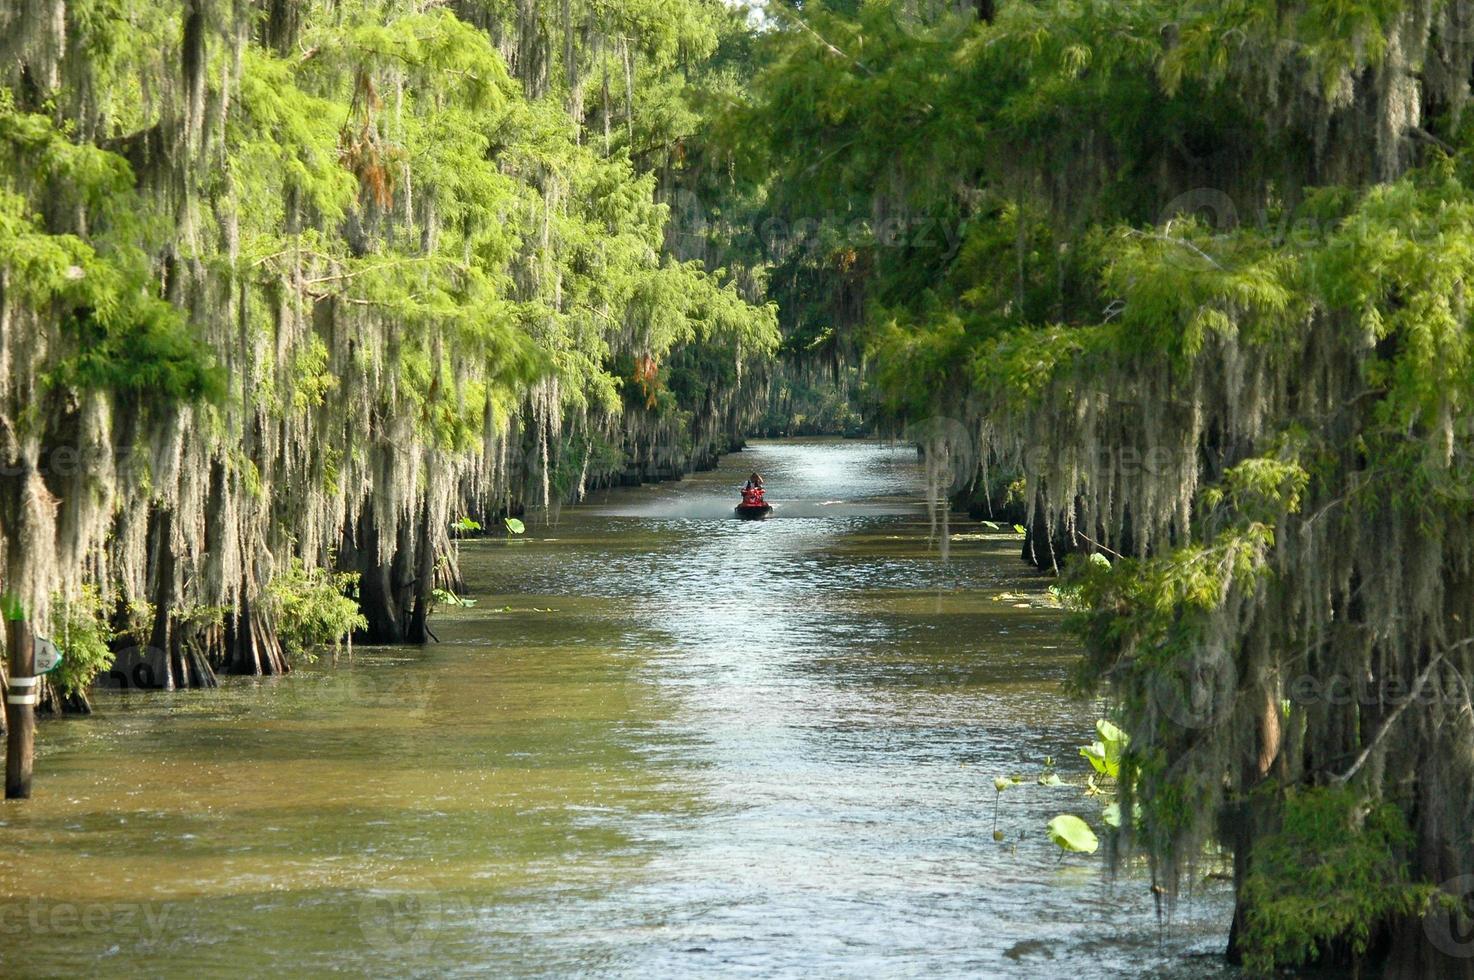 Jet-skiing in swamp photo